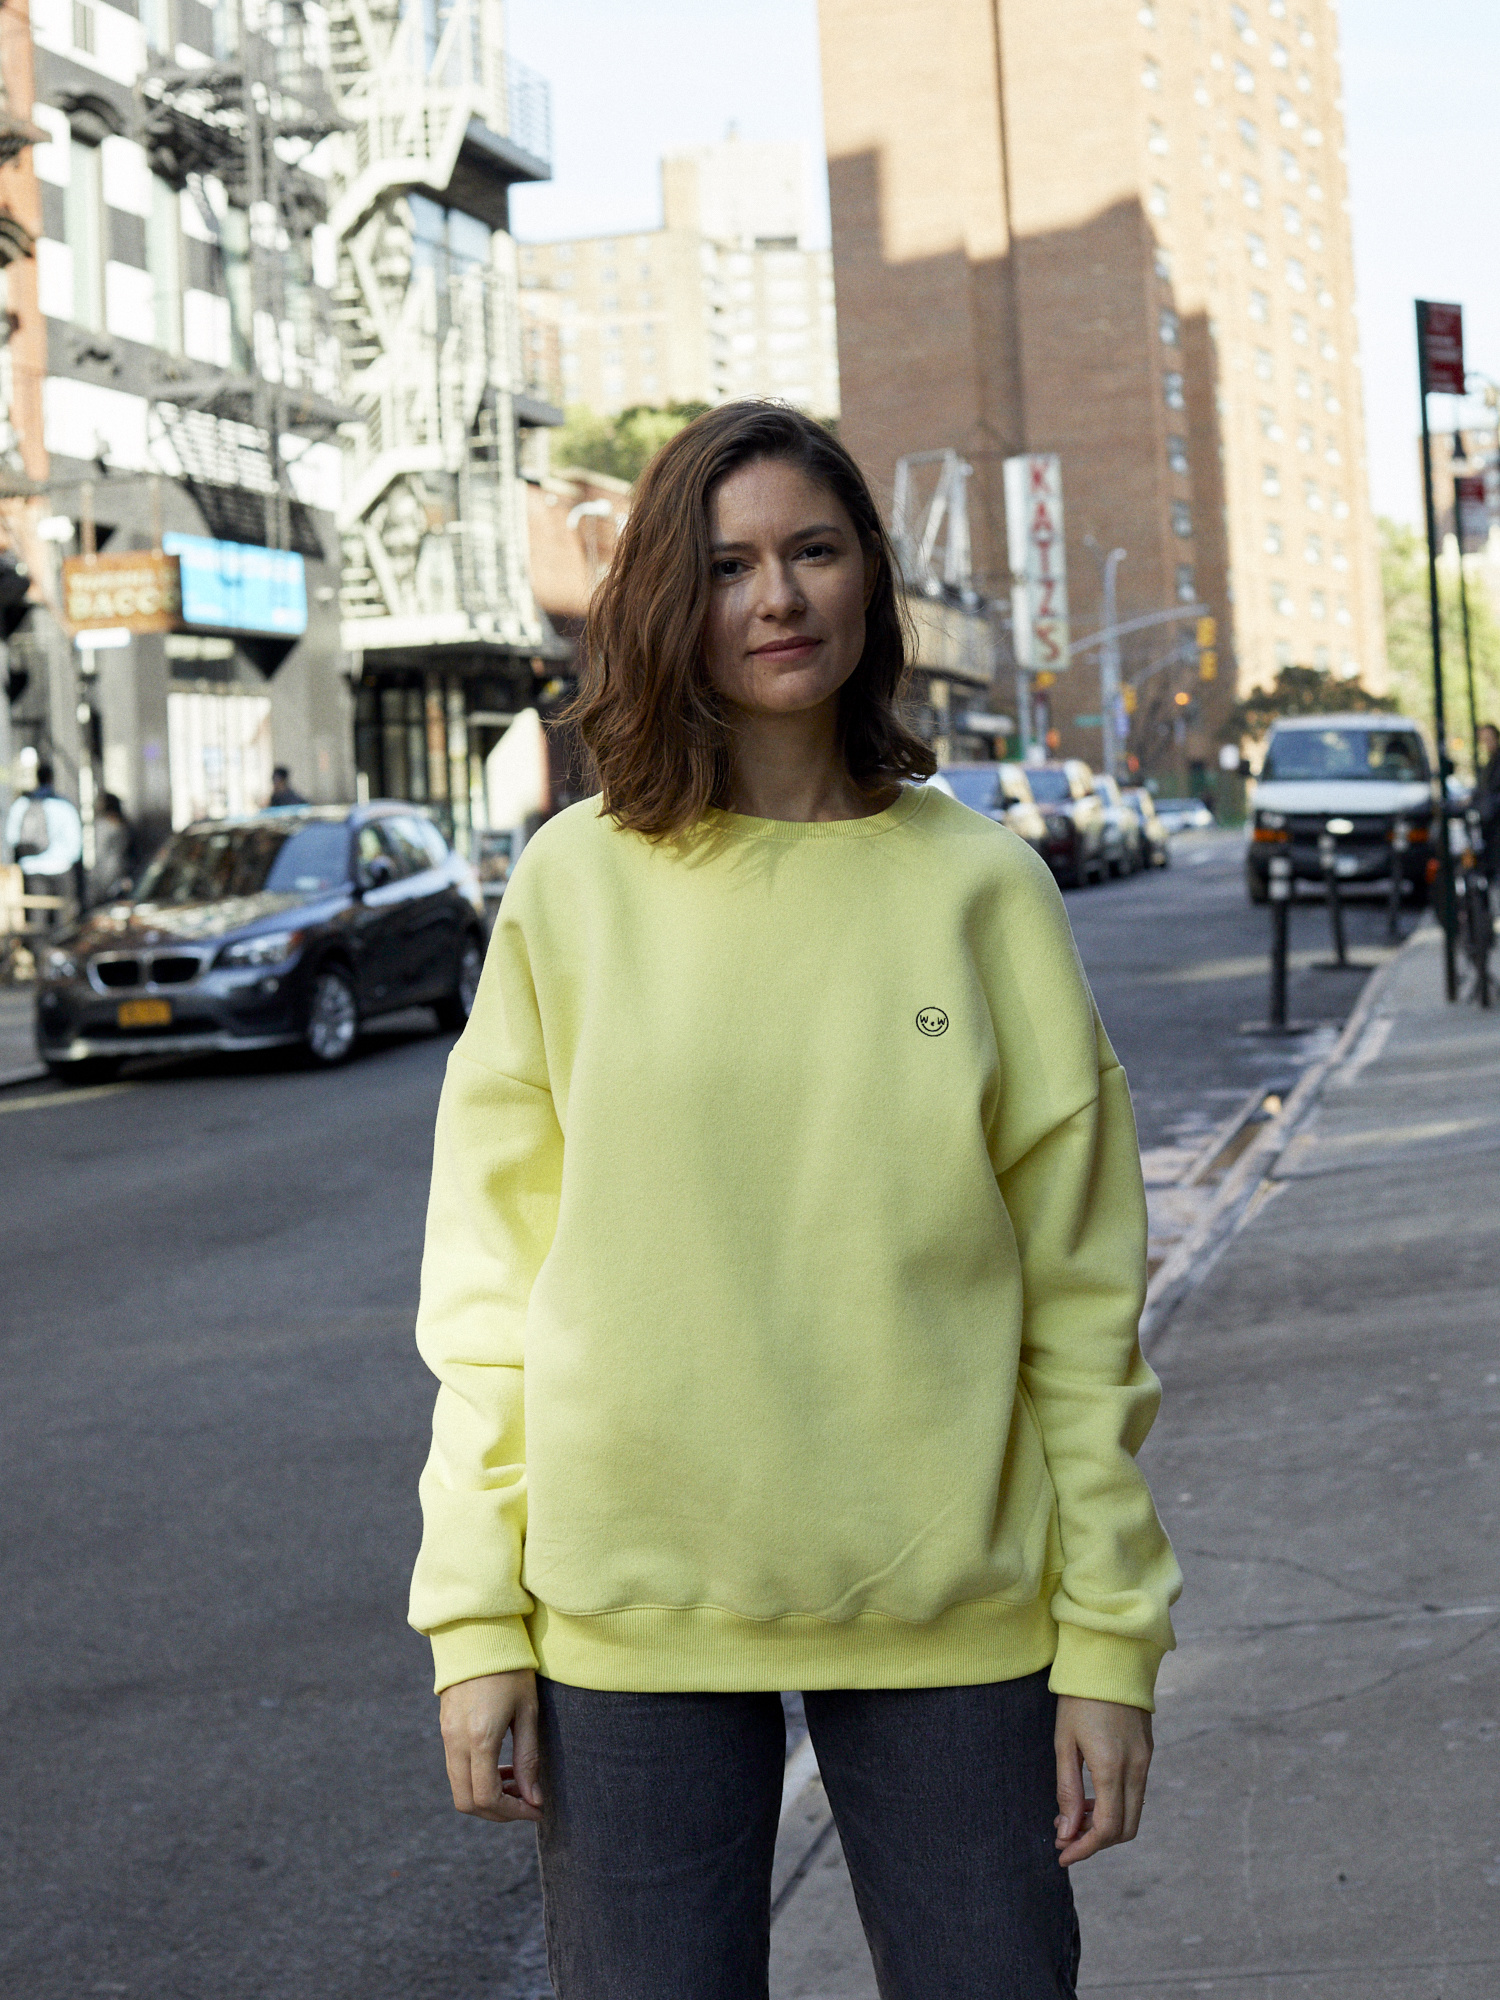 Where Wear Oversized Yellow Sweatshirt